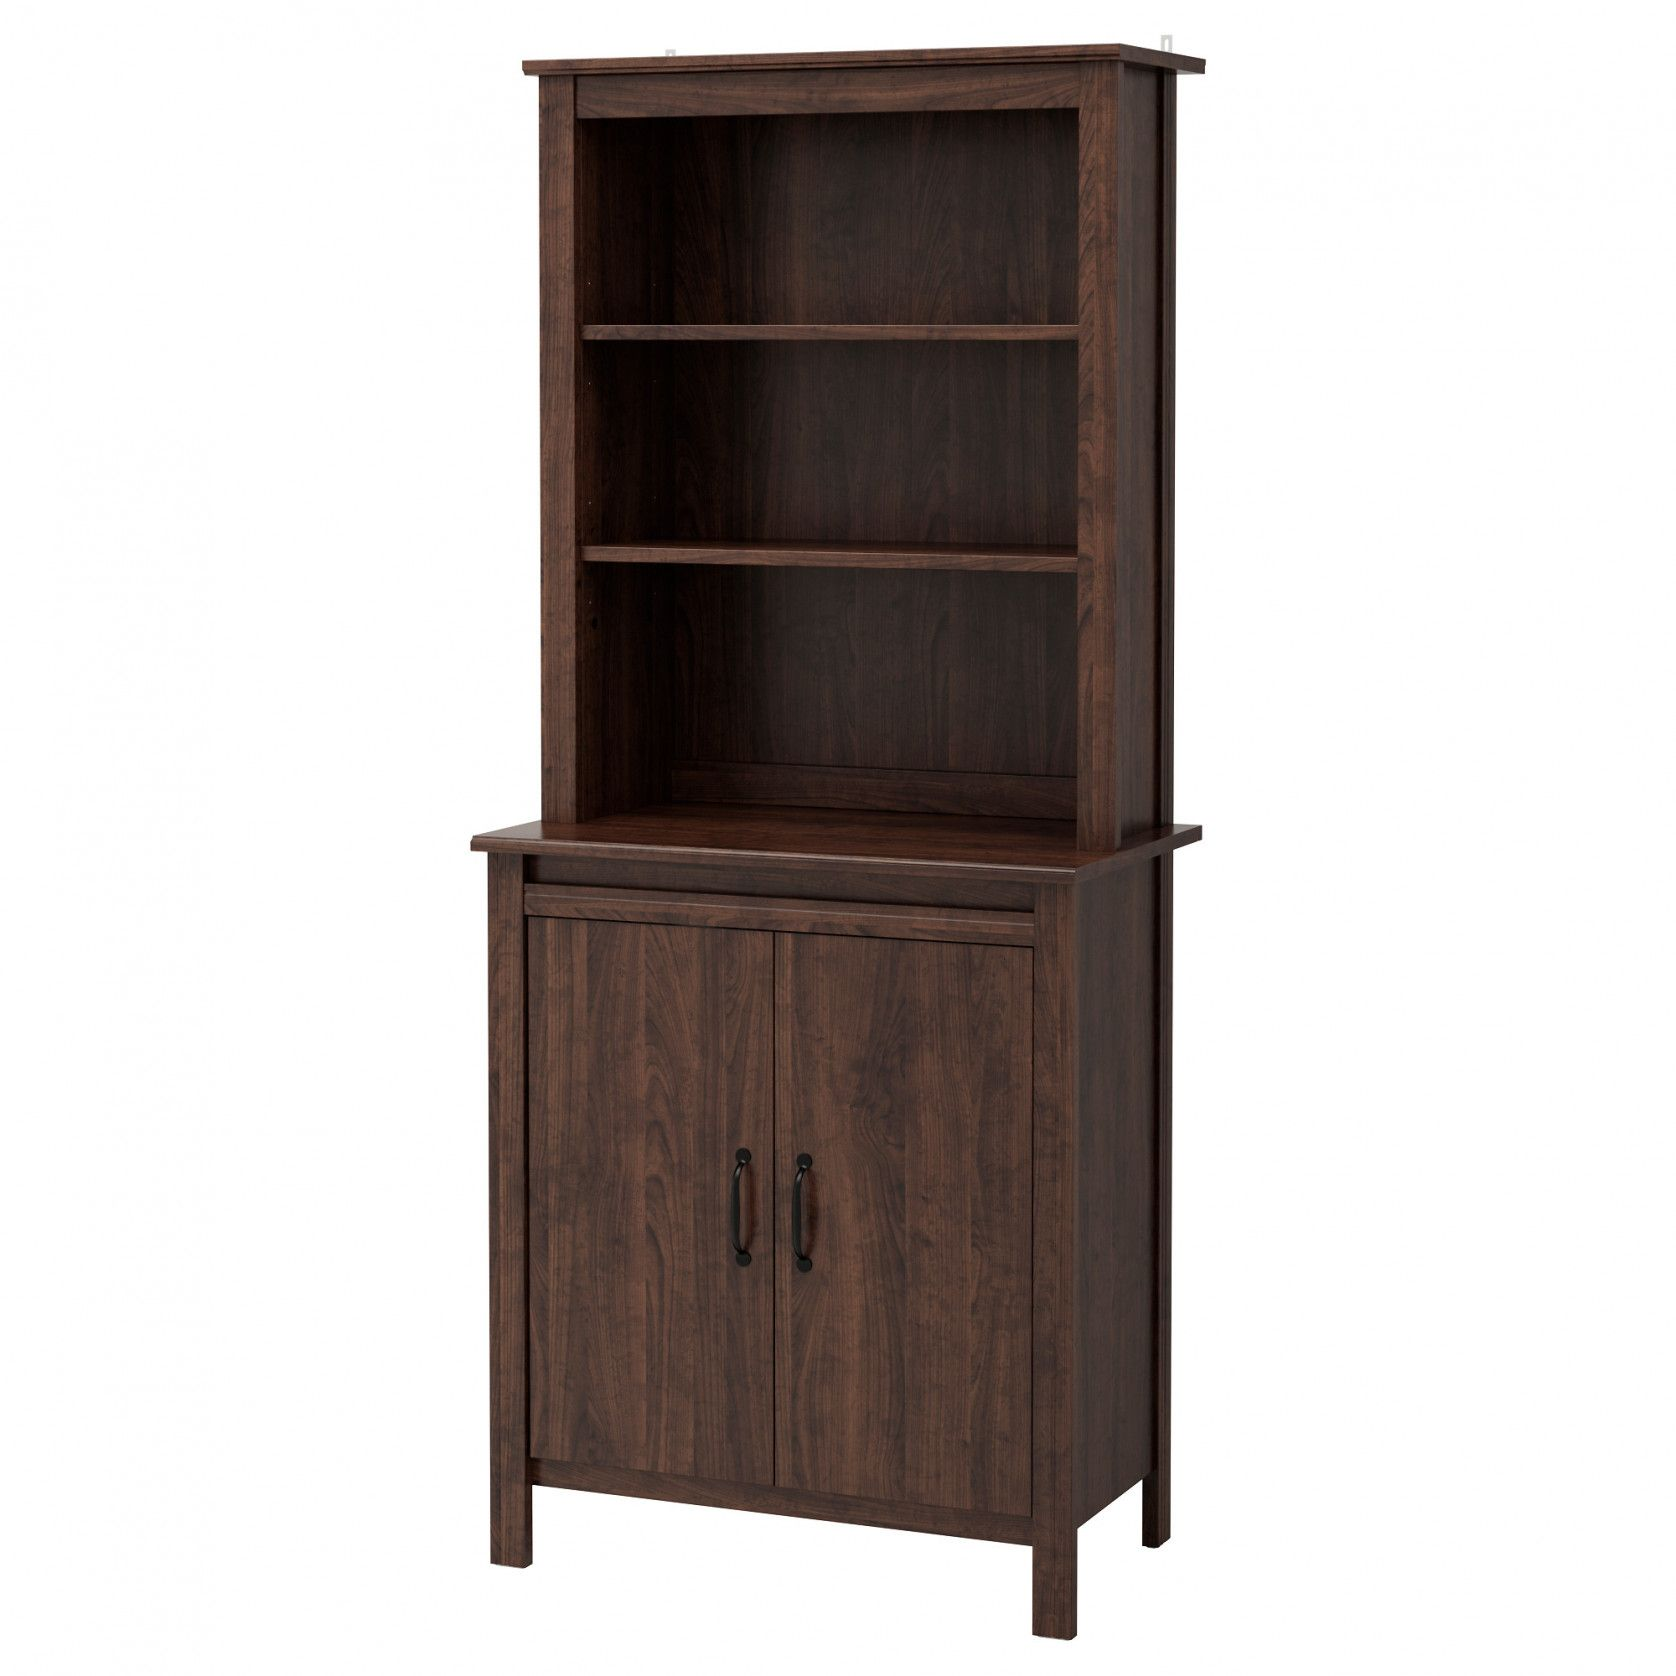 55 Ikea Metal Storage Cabinet Kitchen Decor theme Ideas Check